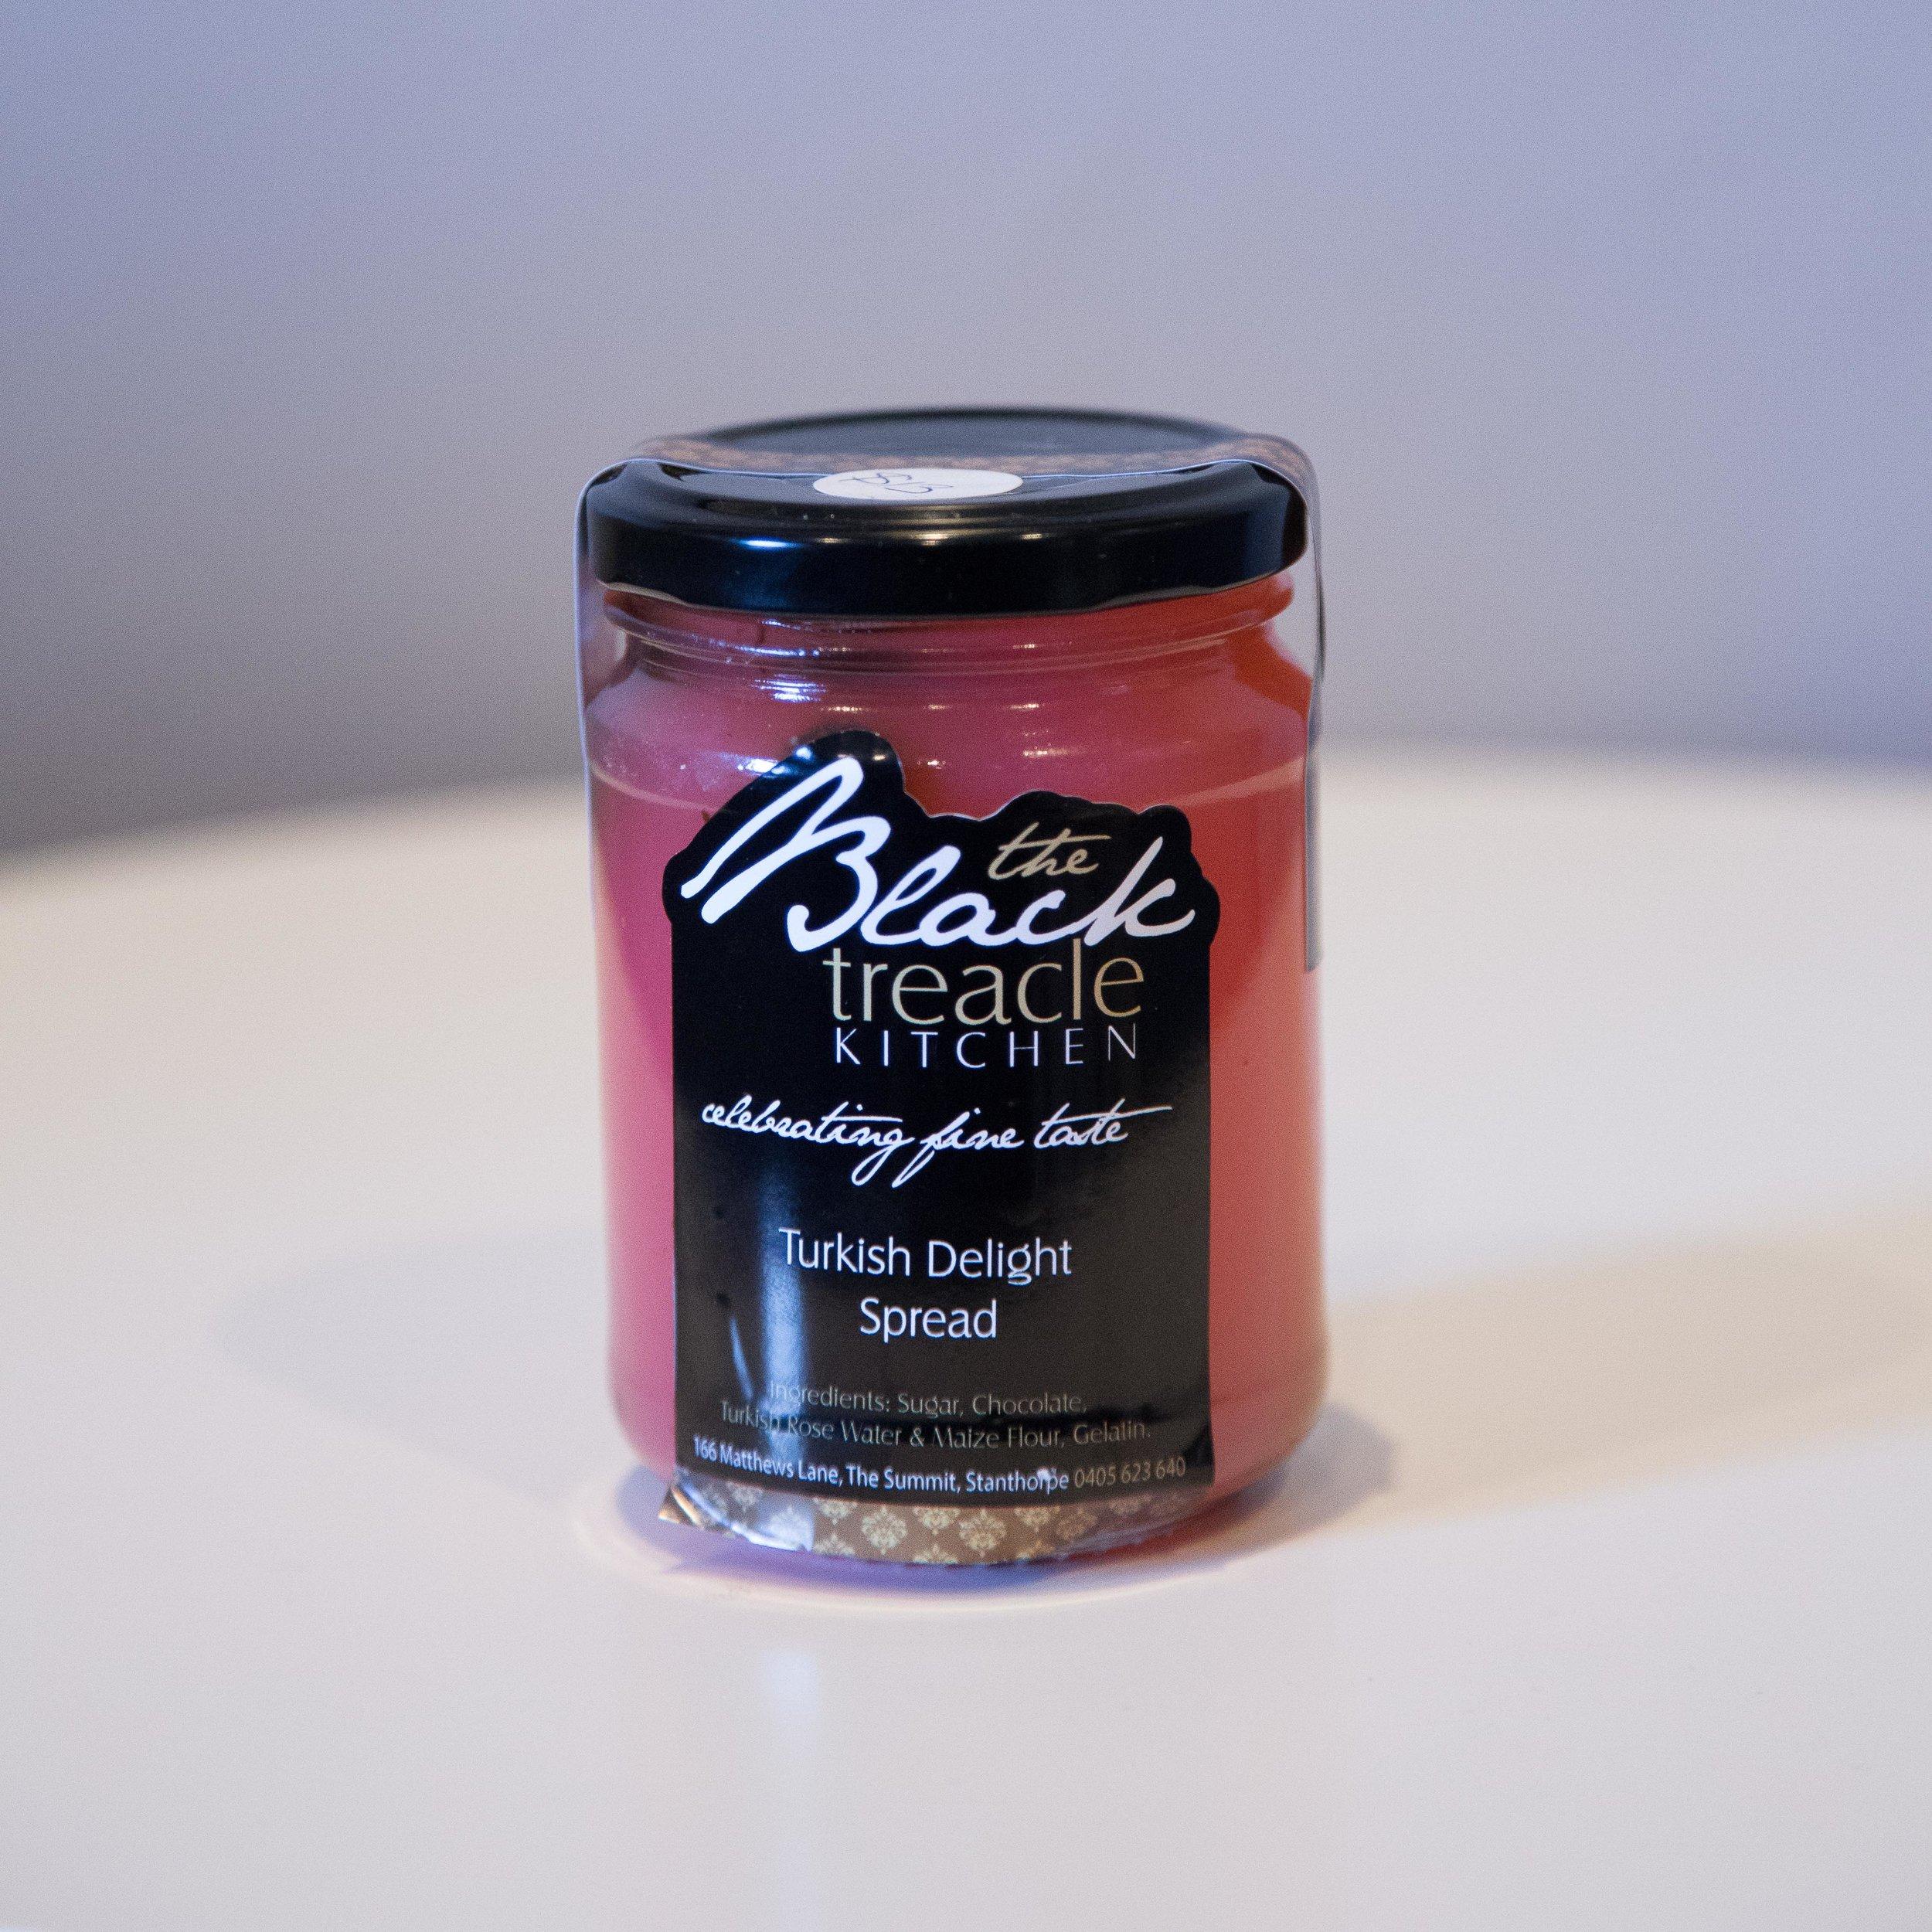 Black Treacle - Turkish Delight Spread - $12